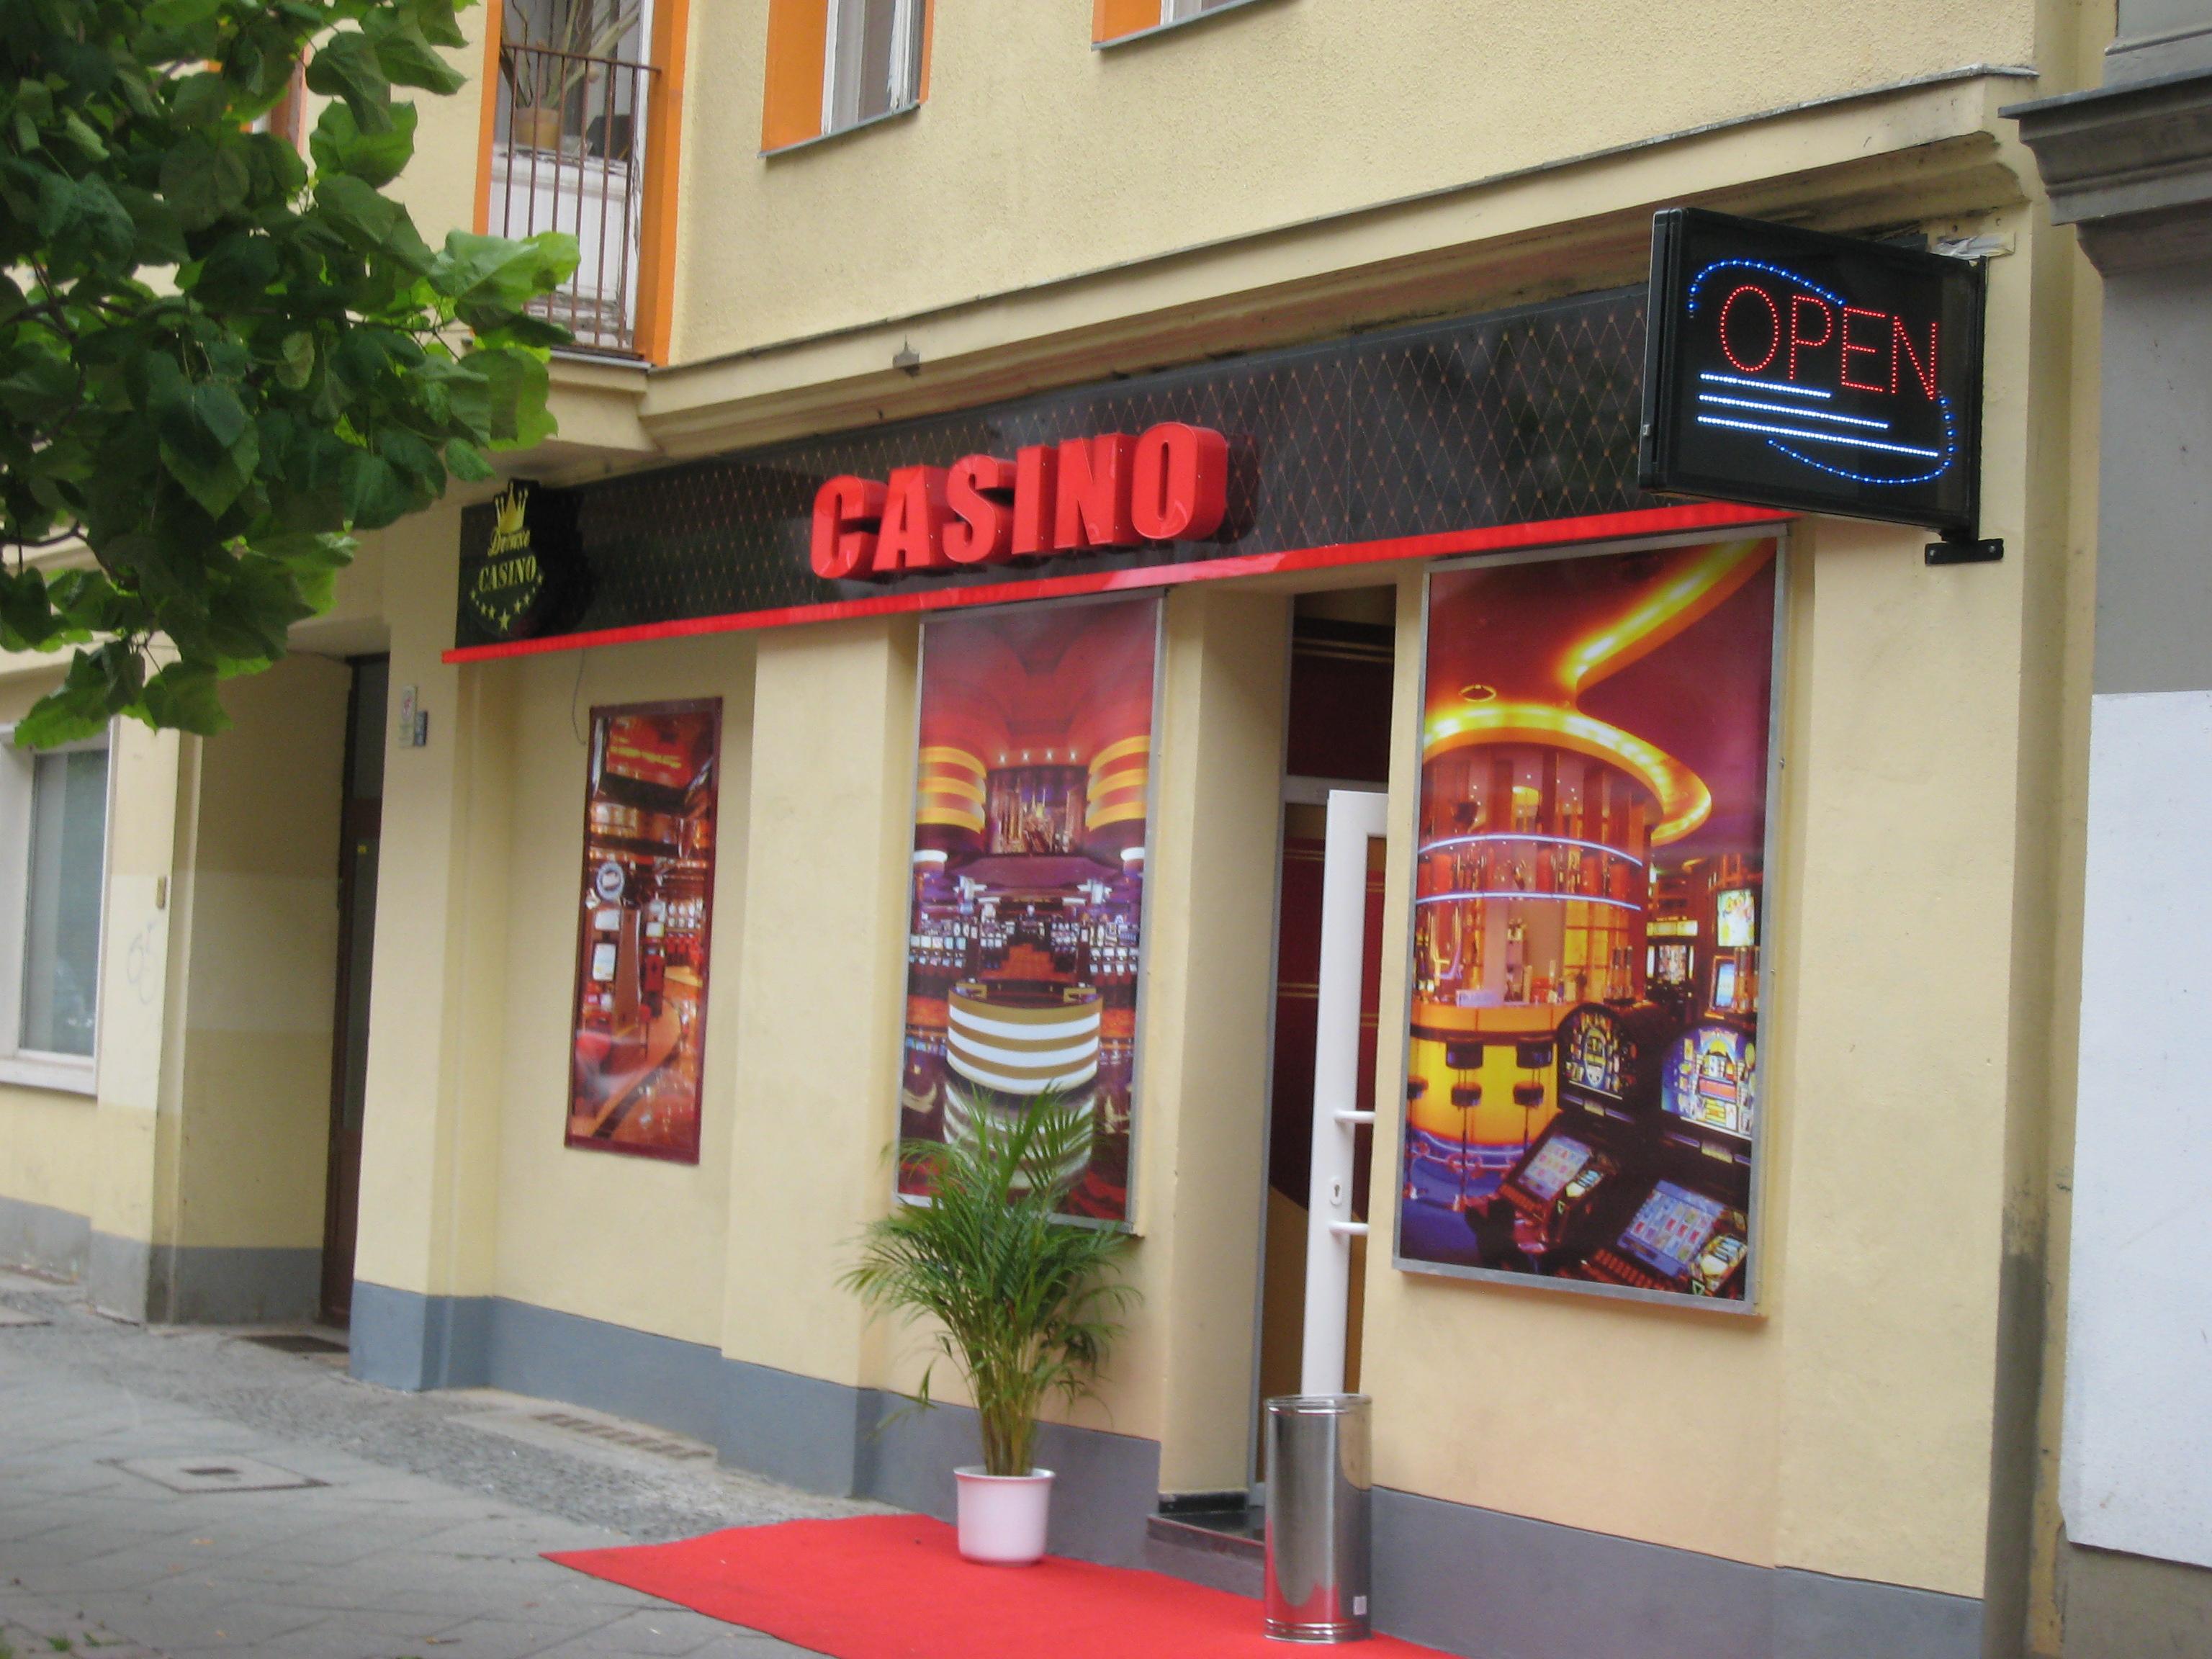 Cda casino concerts